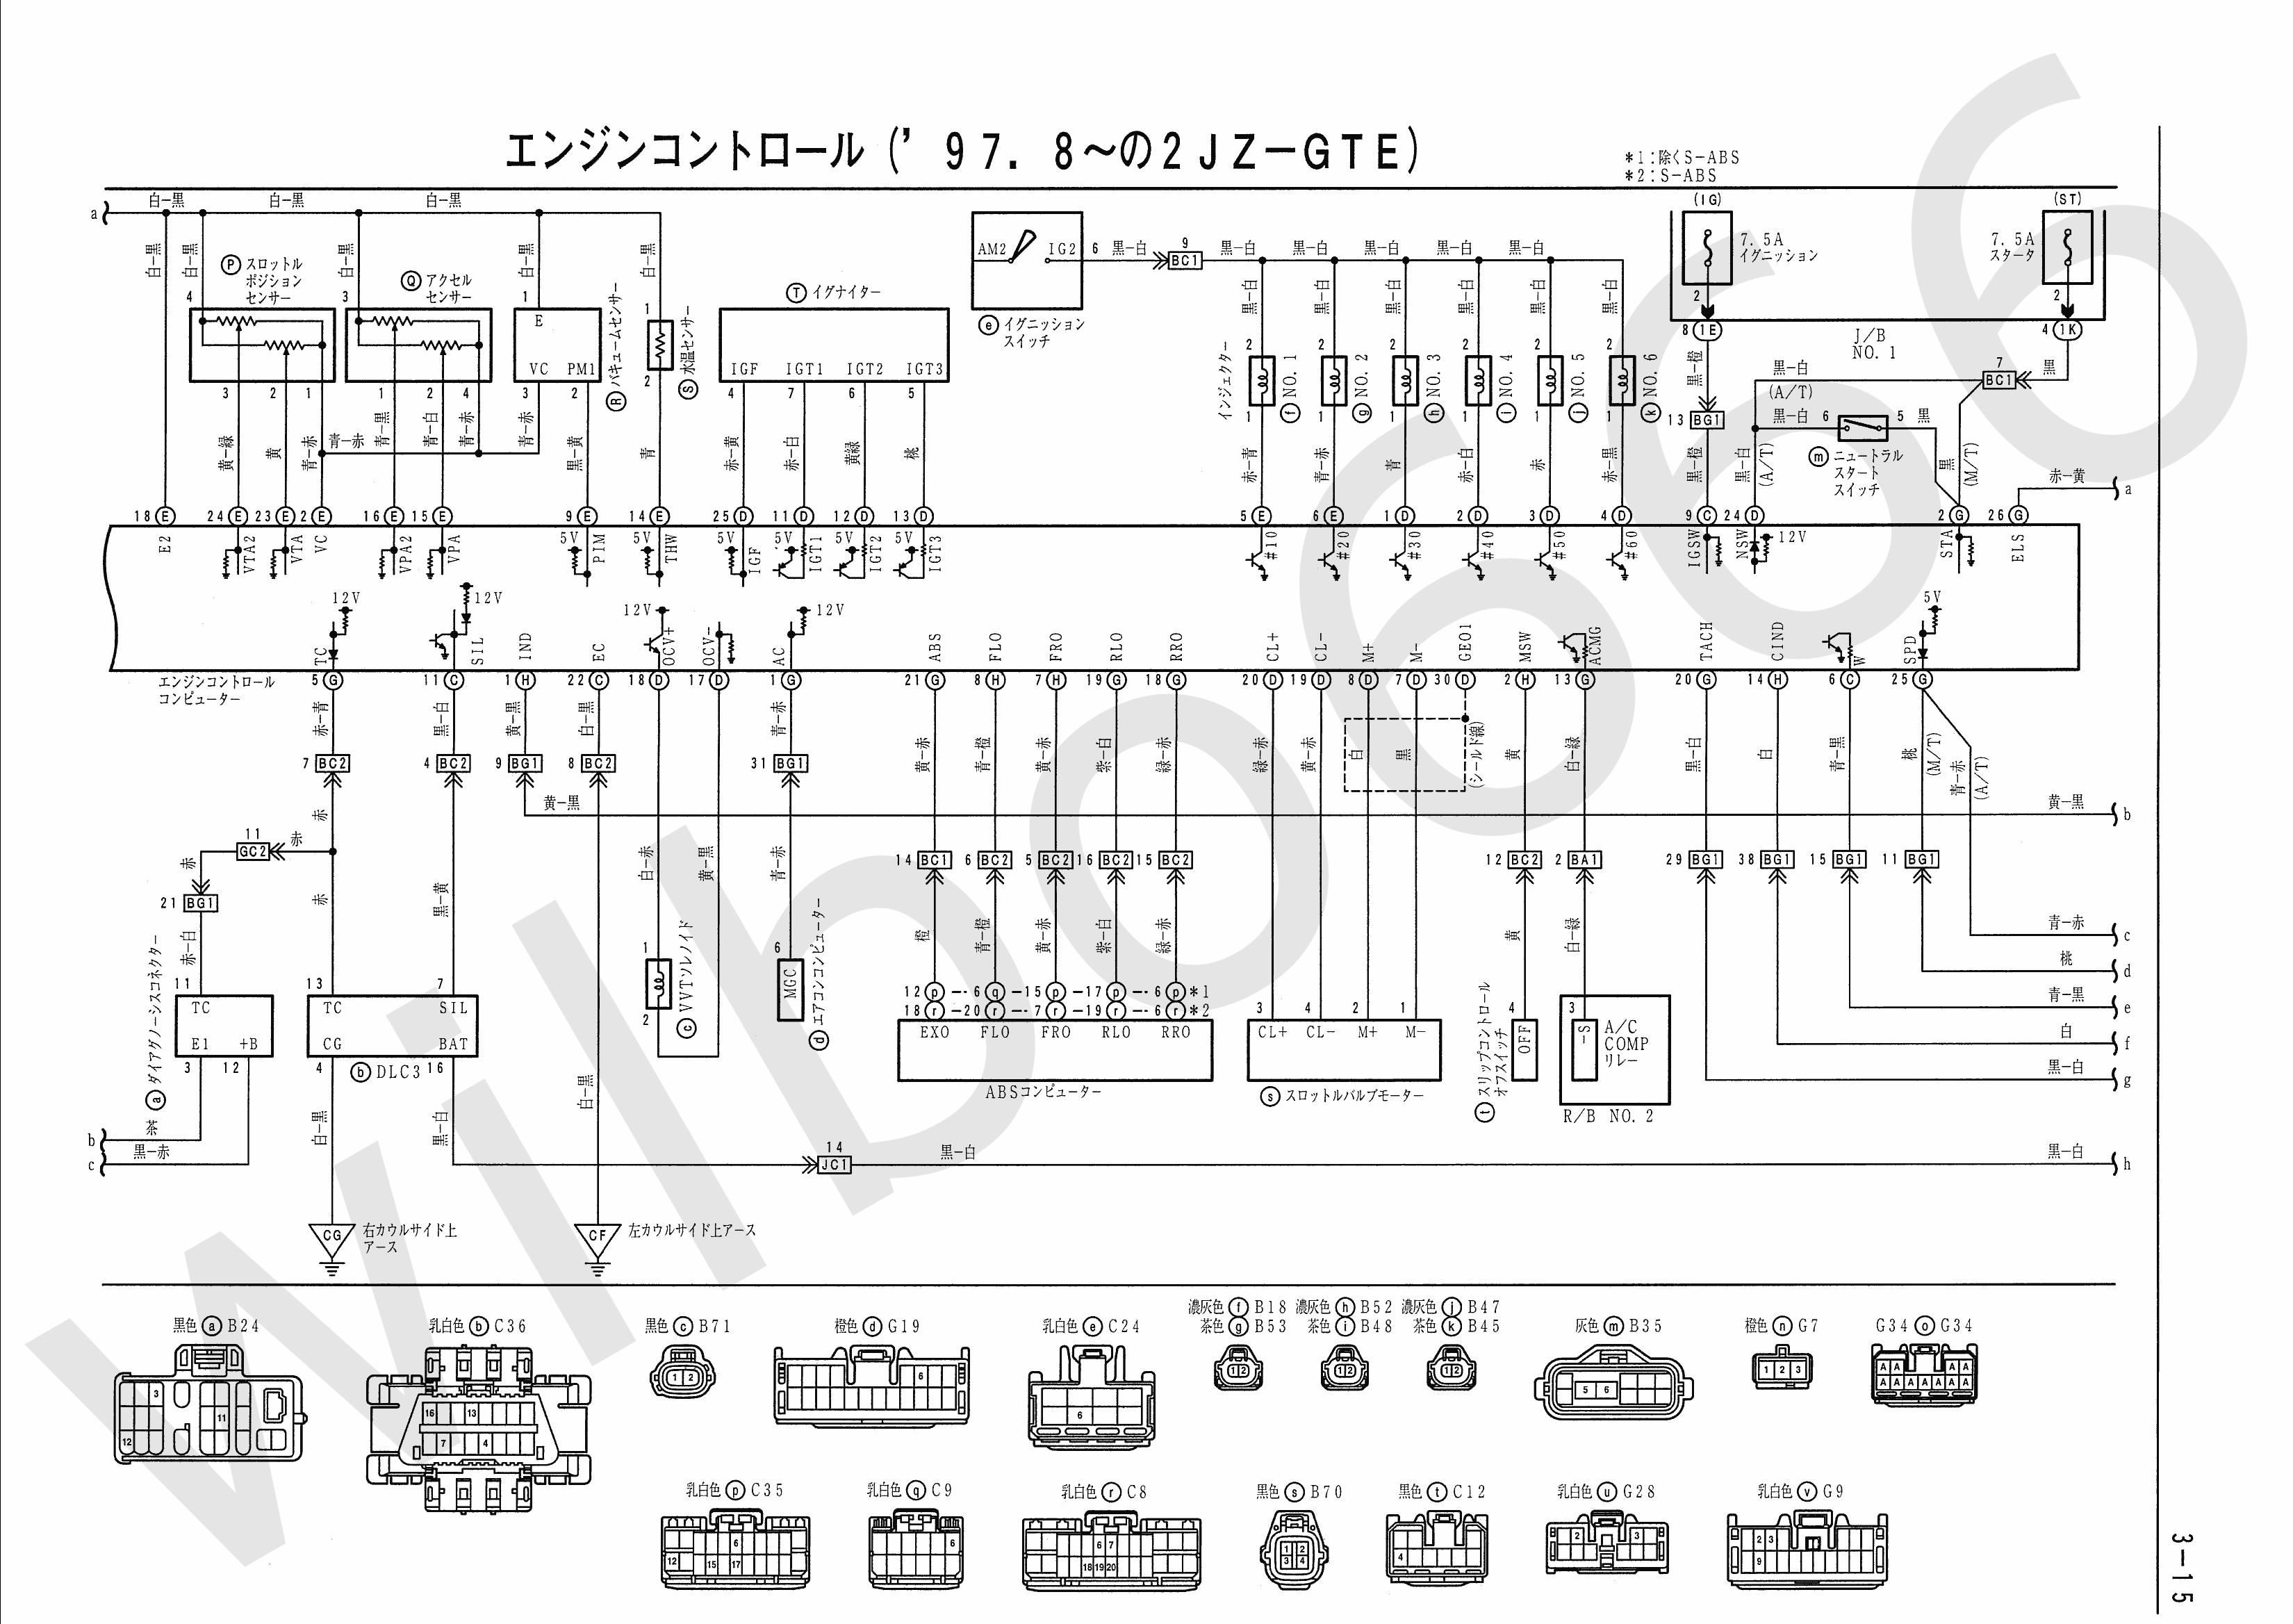 Wiring Diagram Motor Honda Supra : Wilbo jz gte vvti jza supra engine wiring